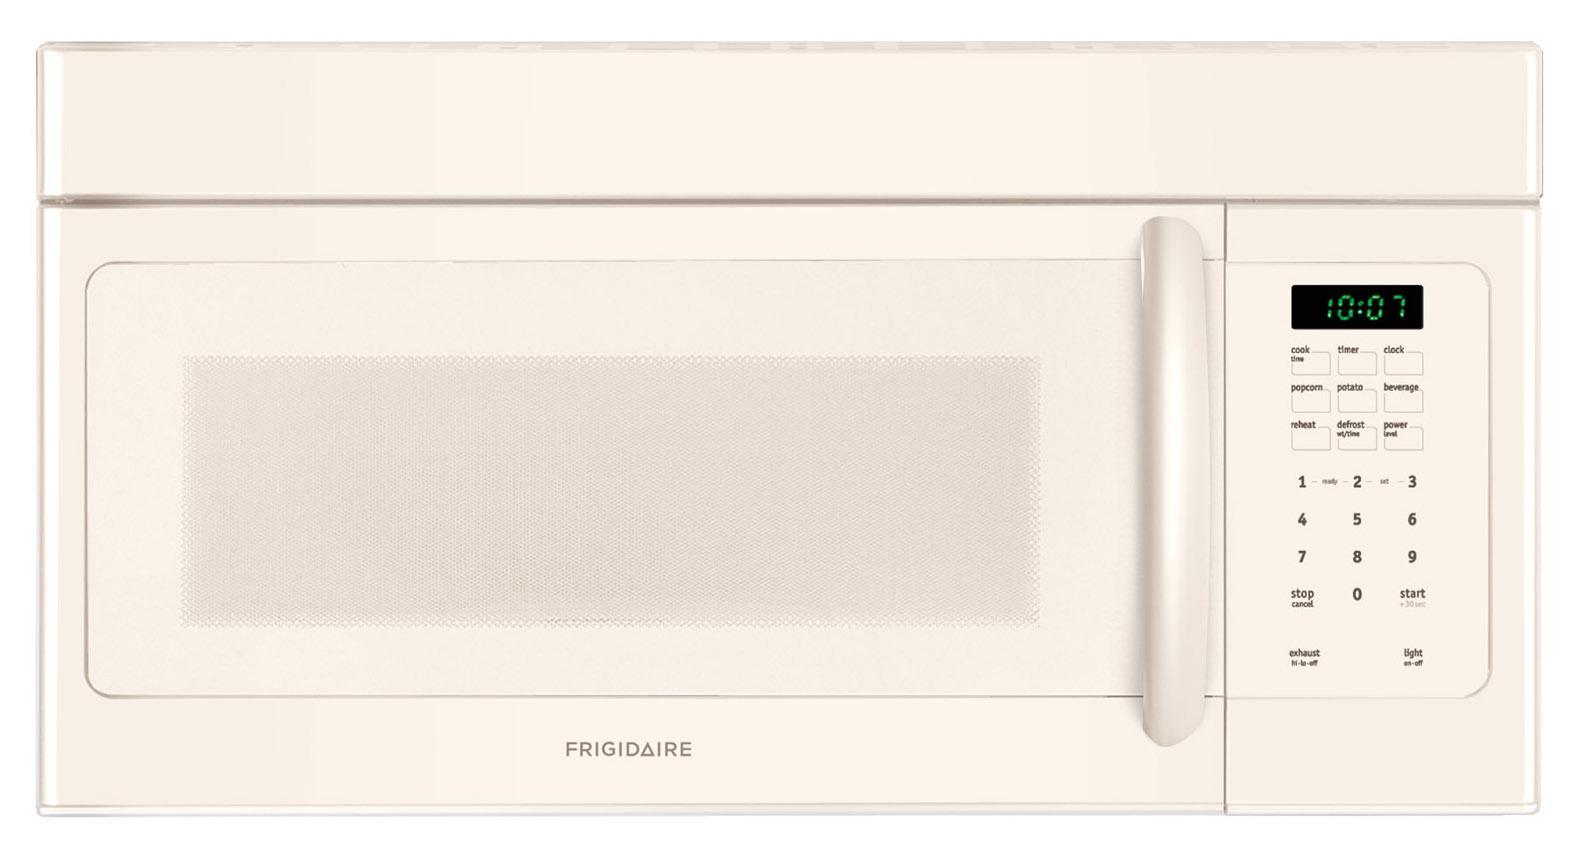 Frigidaire Microwaves 1.6 Cu. Ft. Over-The-Range Microwave - Item Number: FFMV162LQ